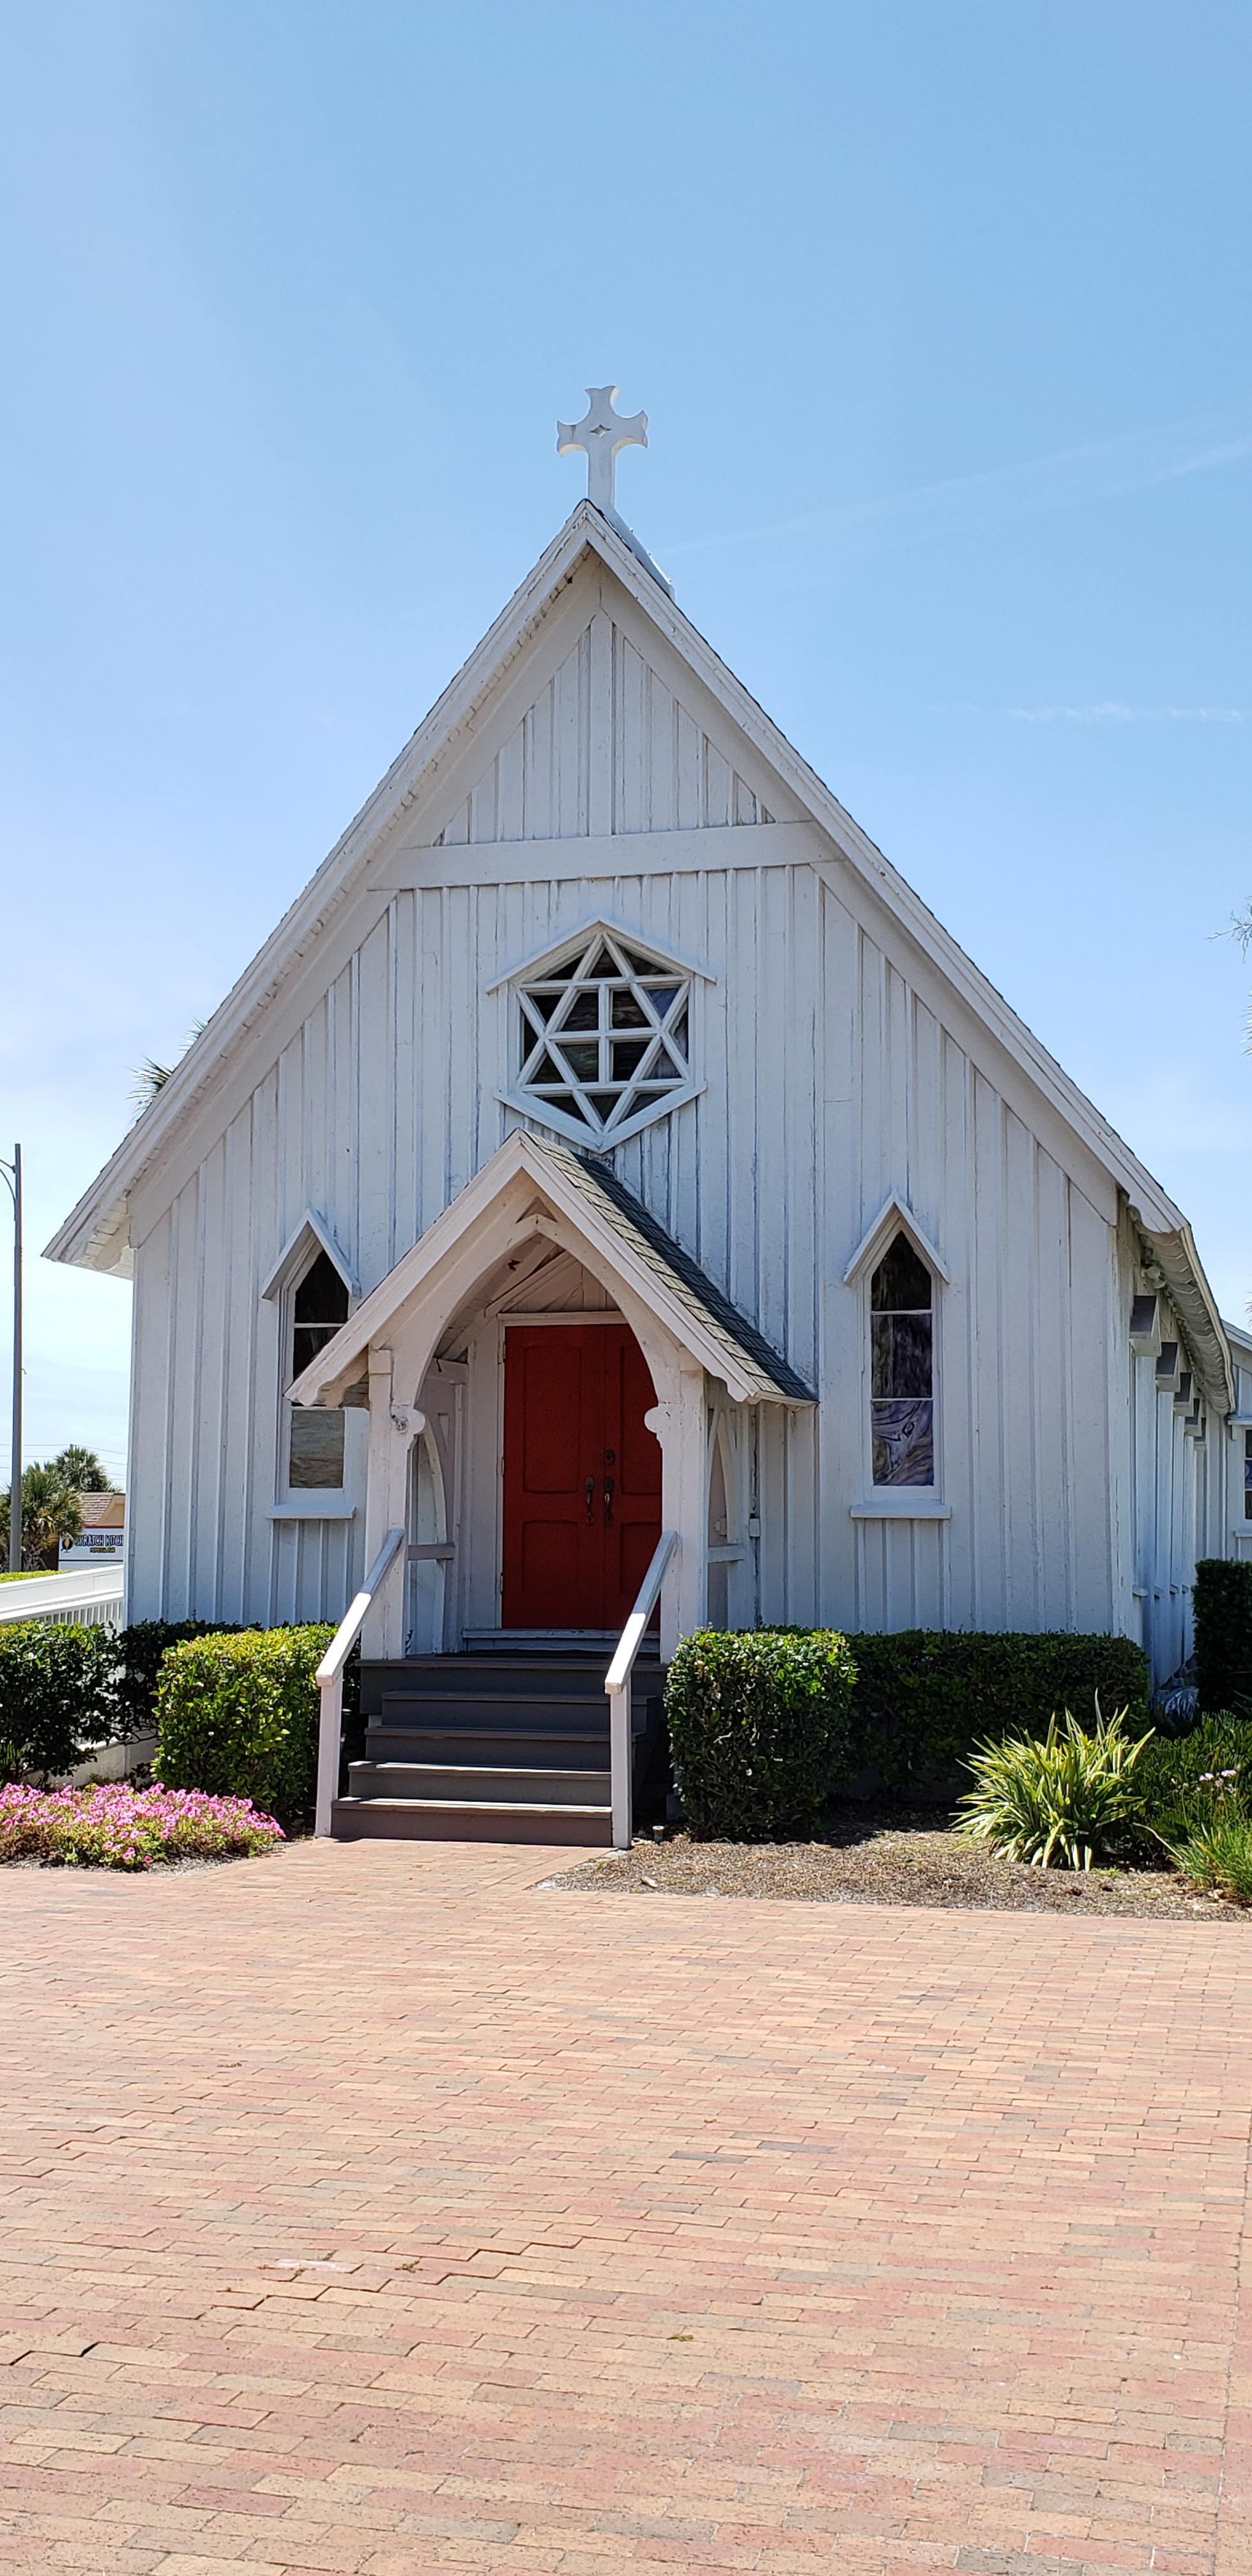 1887 St. Paul's by the Sea Episcopal Chapel